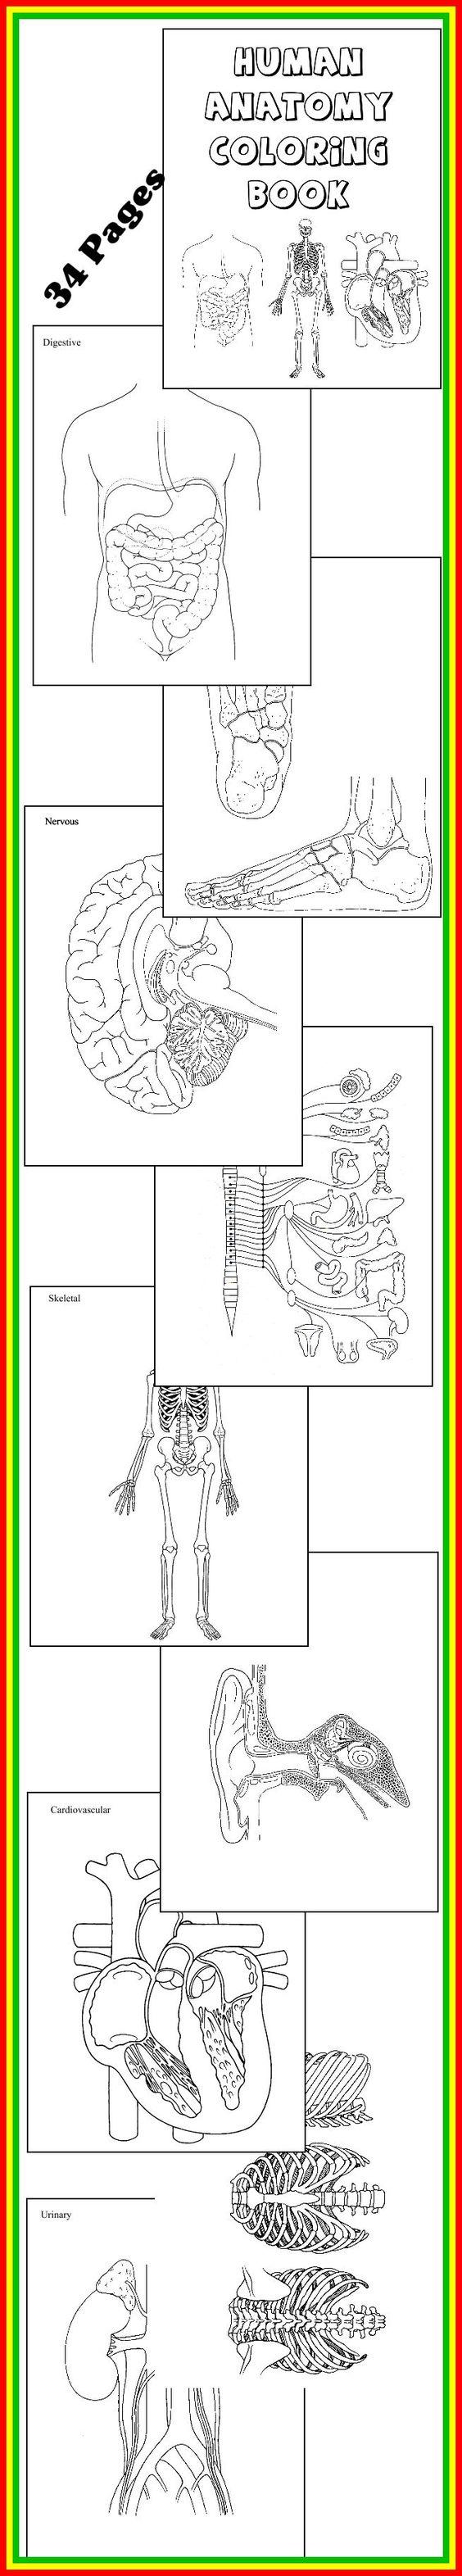 Science Download Human Anatomy Coloring Book 32 Diagrams To